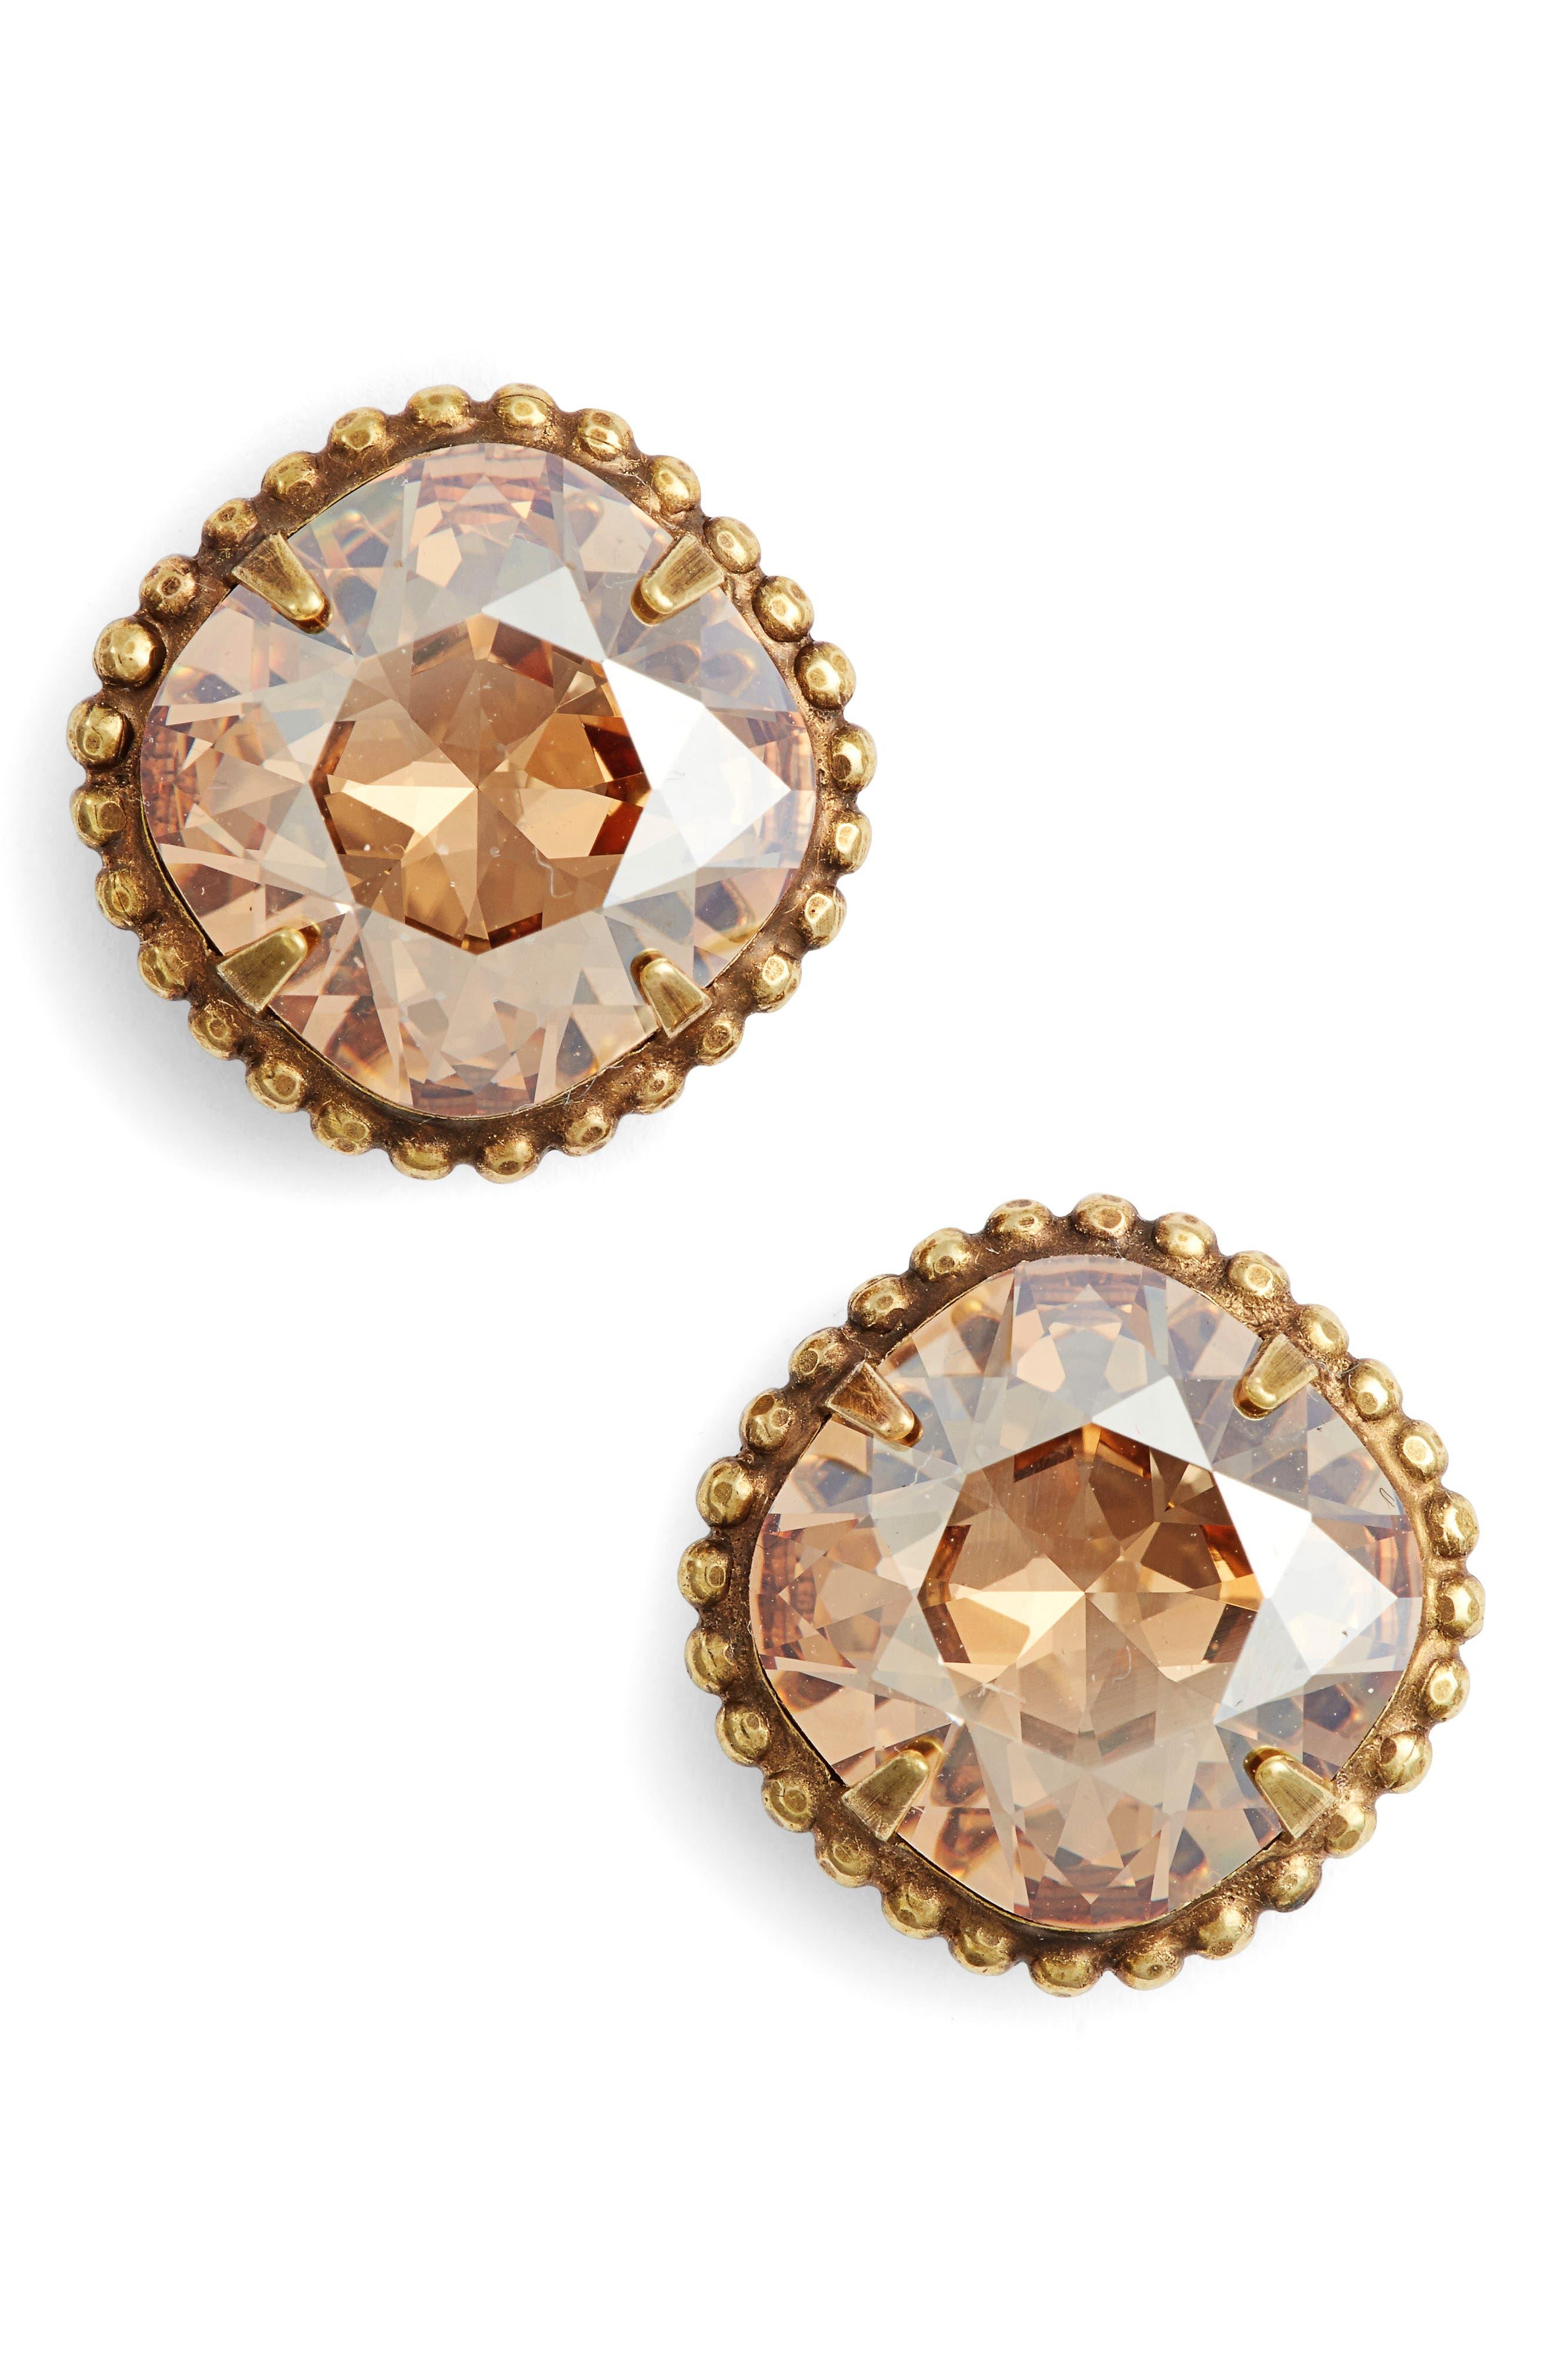 Main Image - Sorrelli Cushion Cut Solitaire Stud Earrings